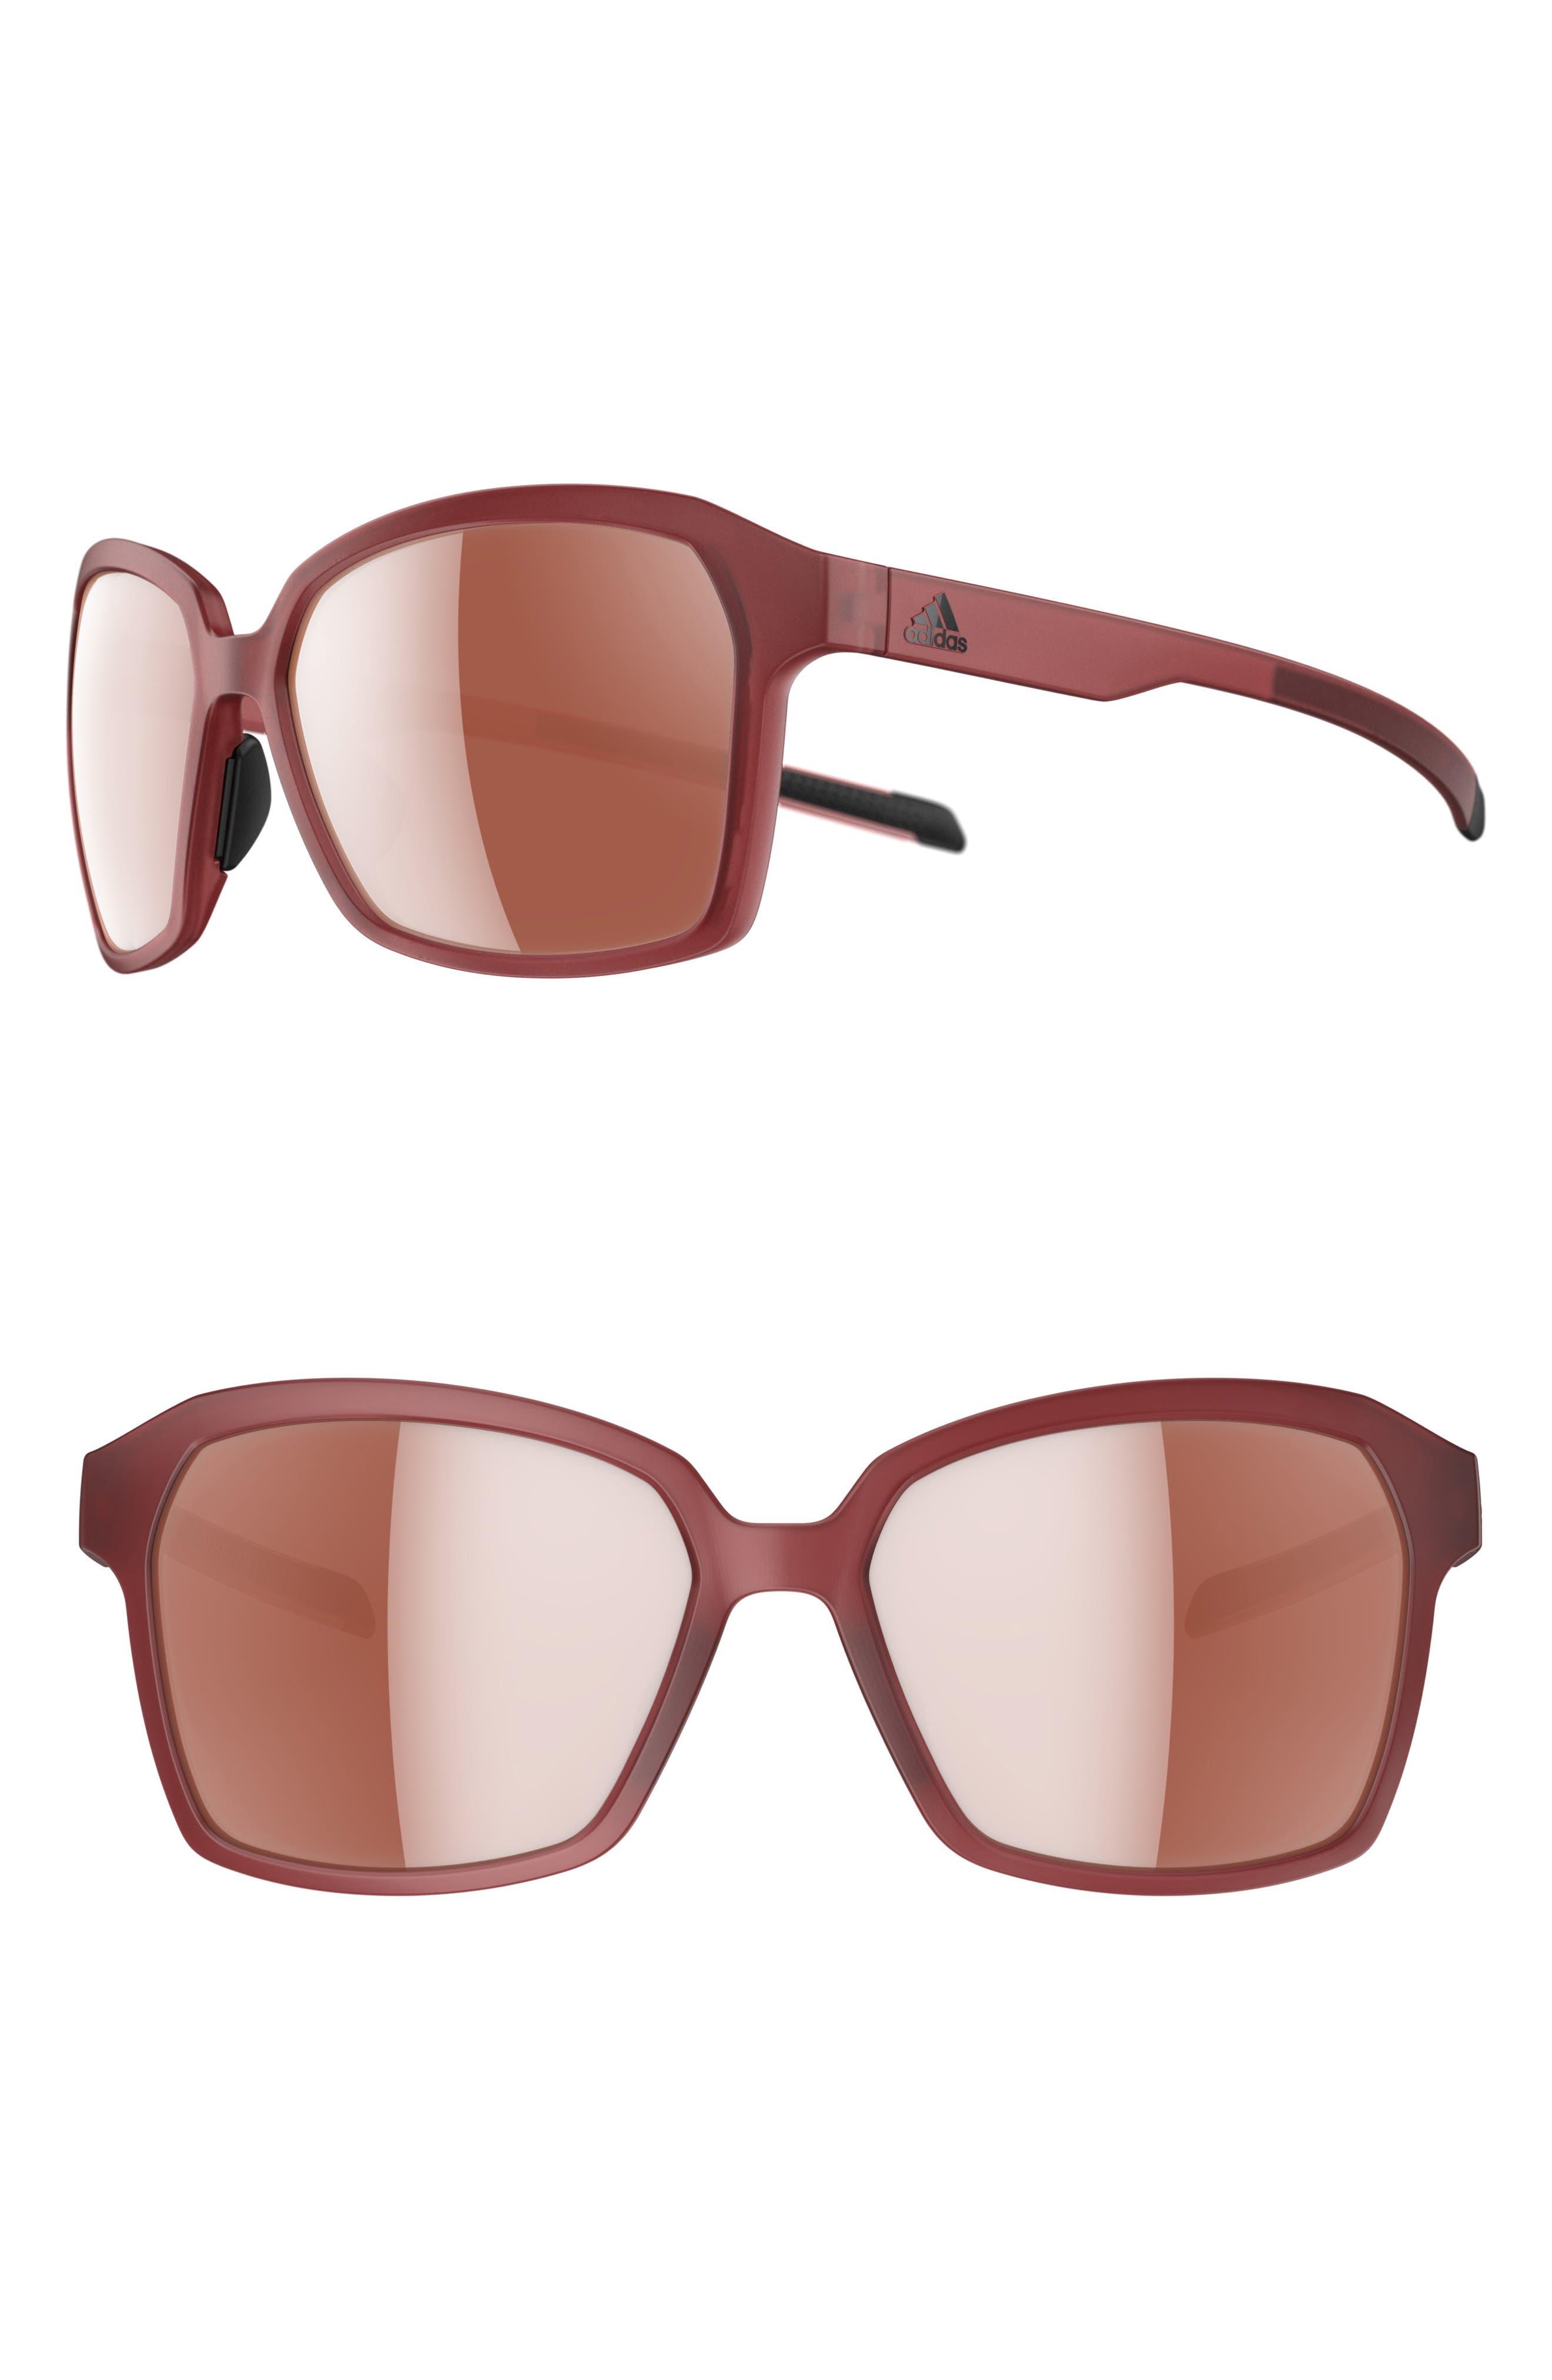 Aspyr Lst 58mm Sunglasses,                             Main thumbnail 1, color,                             TRACE MAROON MATTE/SILVER